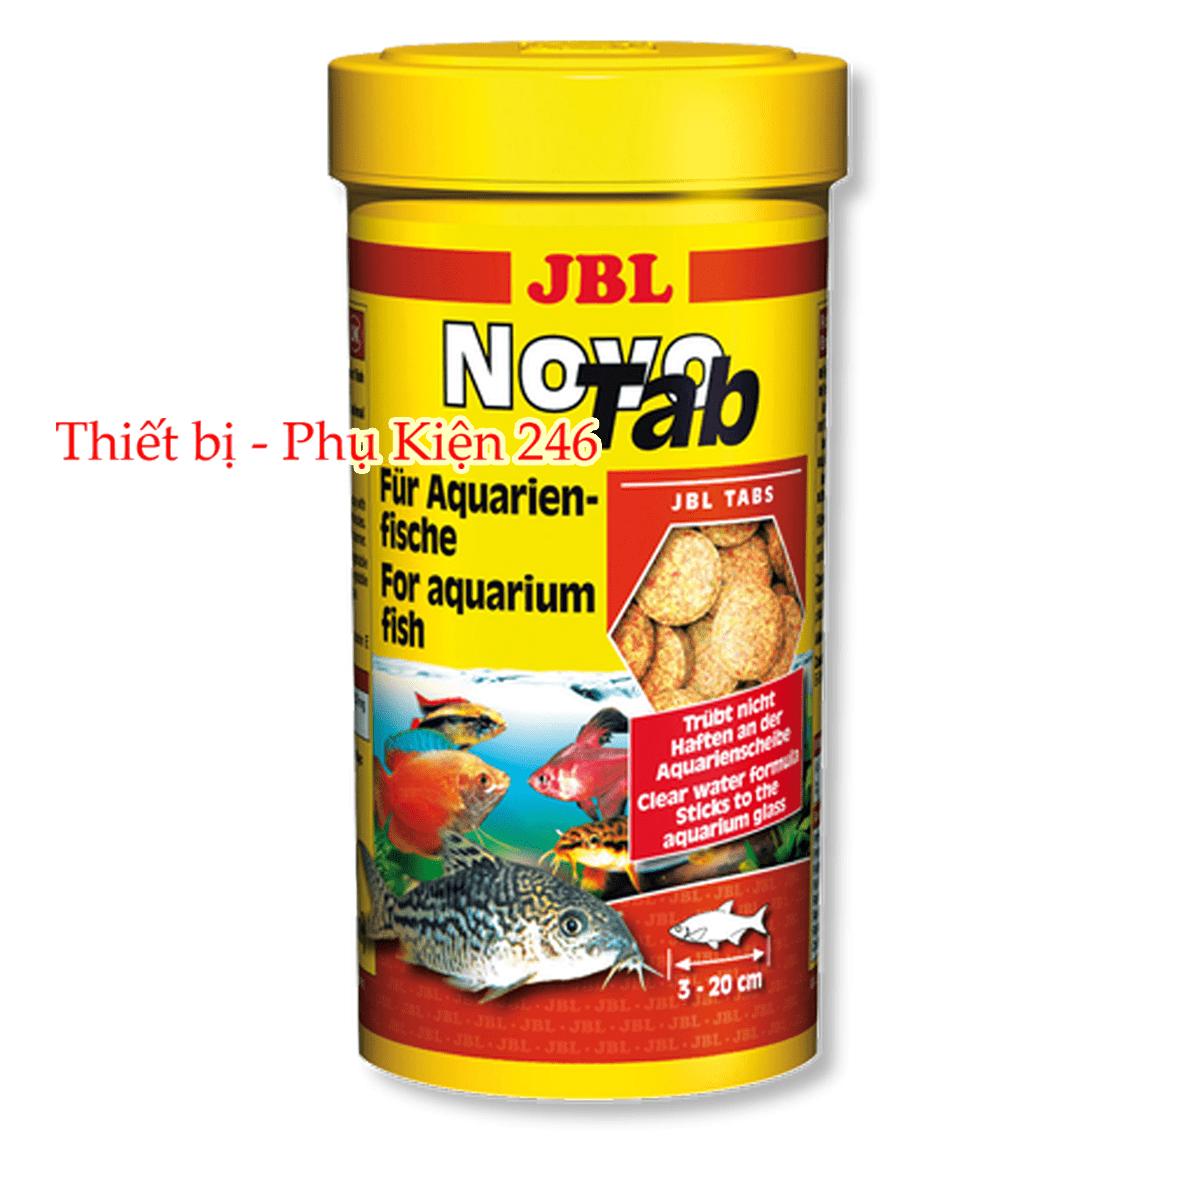 jbl-novotab-thuc-an-vien-dan-danh-cho-ca-trong-ho-thuy-sinh-duc-160-vienjbl-novotab-thuc-an-vien-dan-danh-cho-ca-trong-ho-thuy-sinh-duc-160-vien